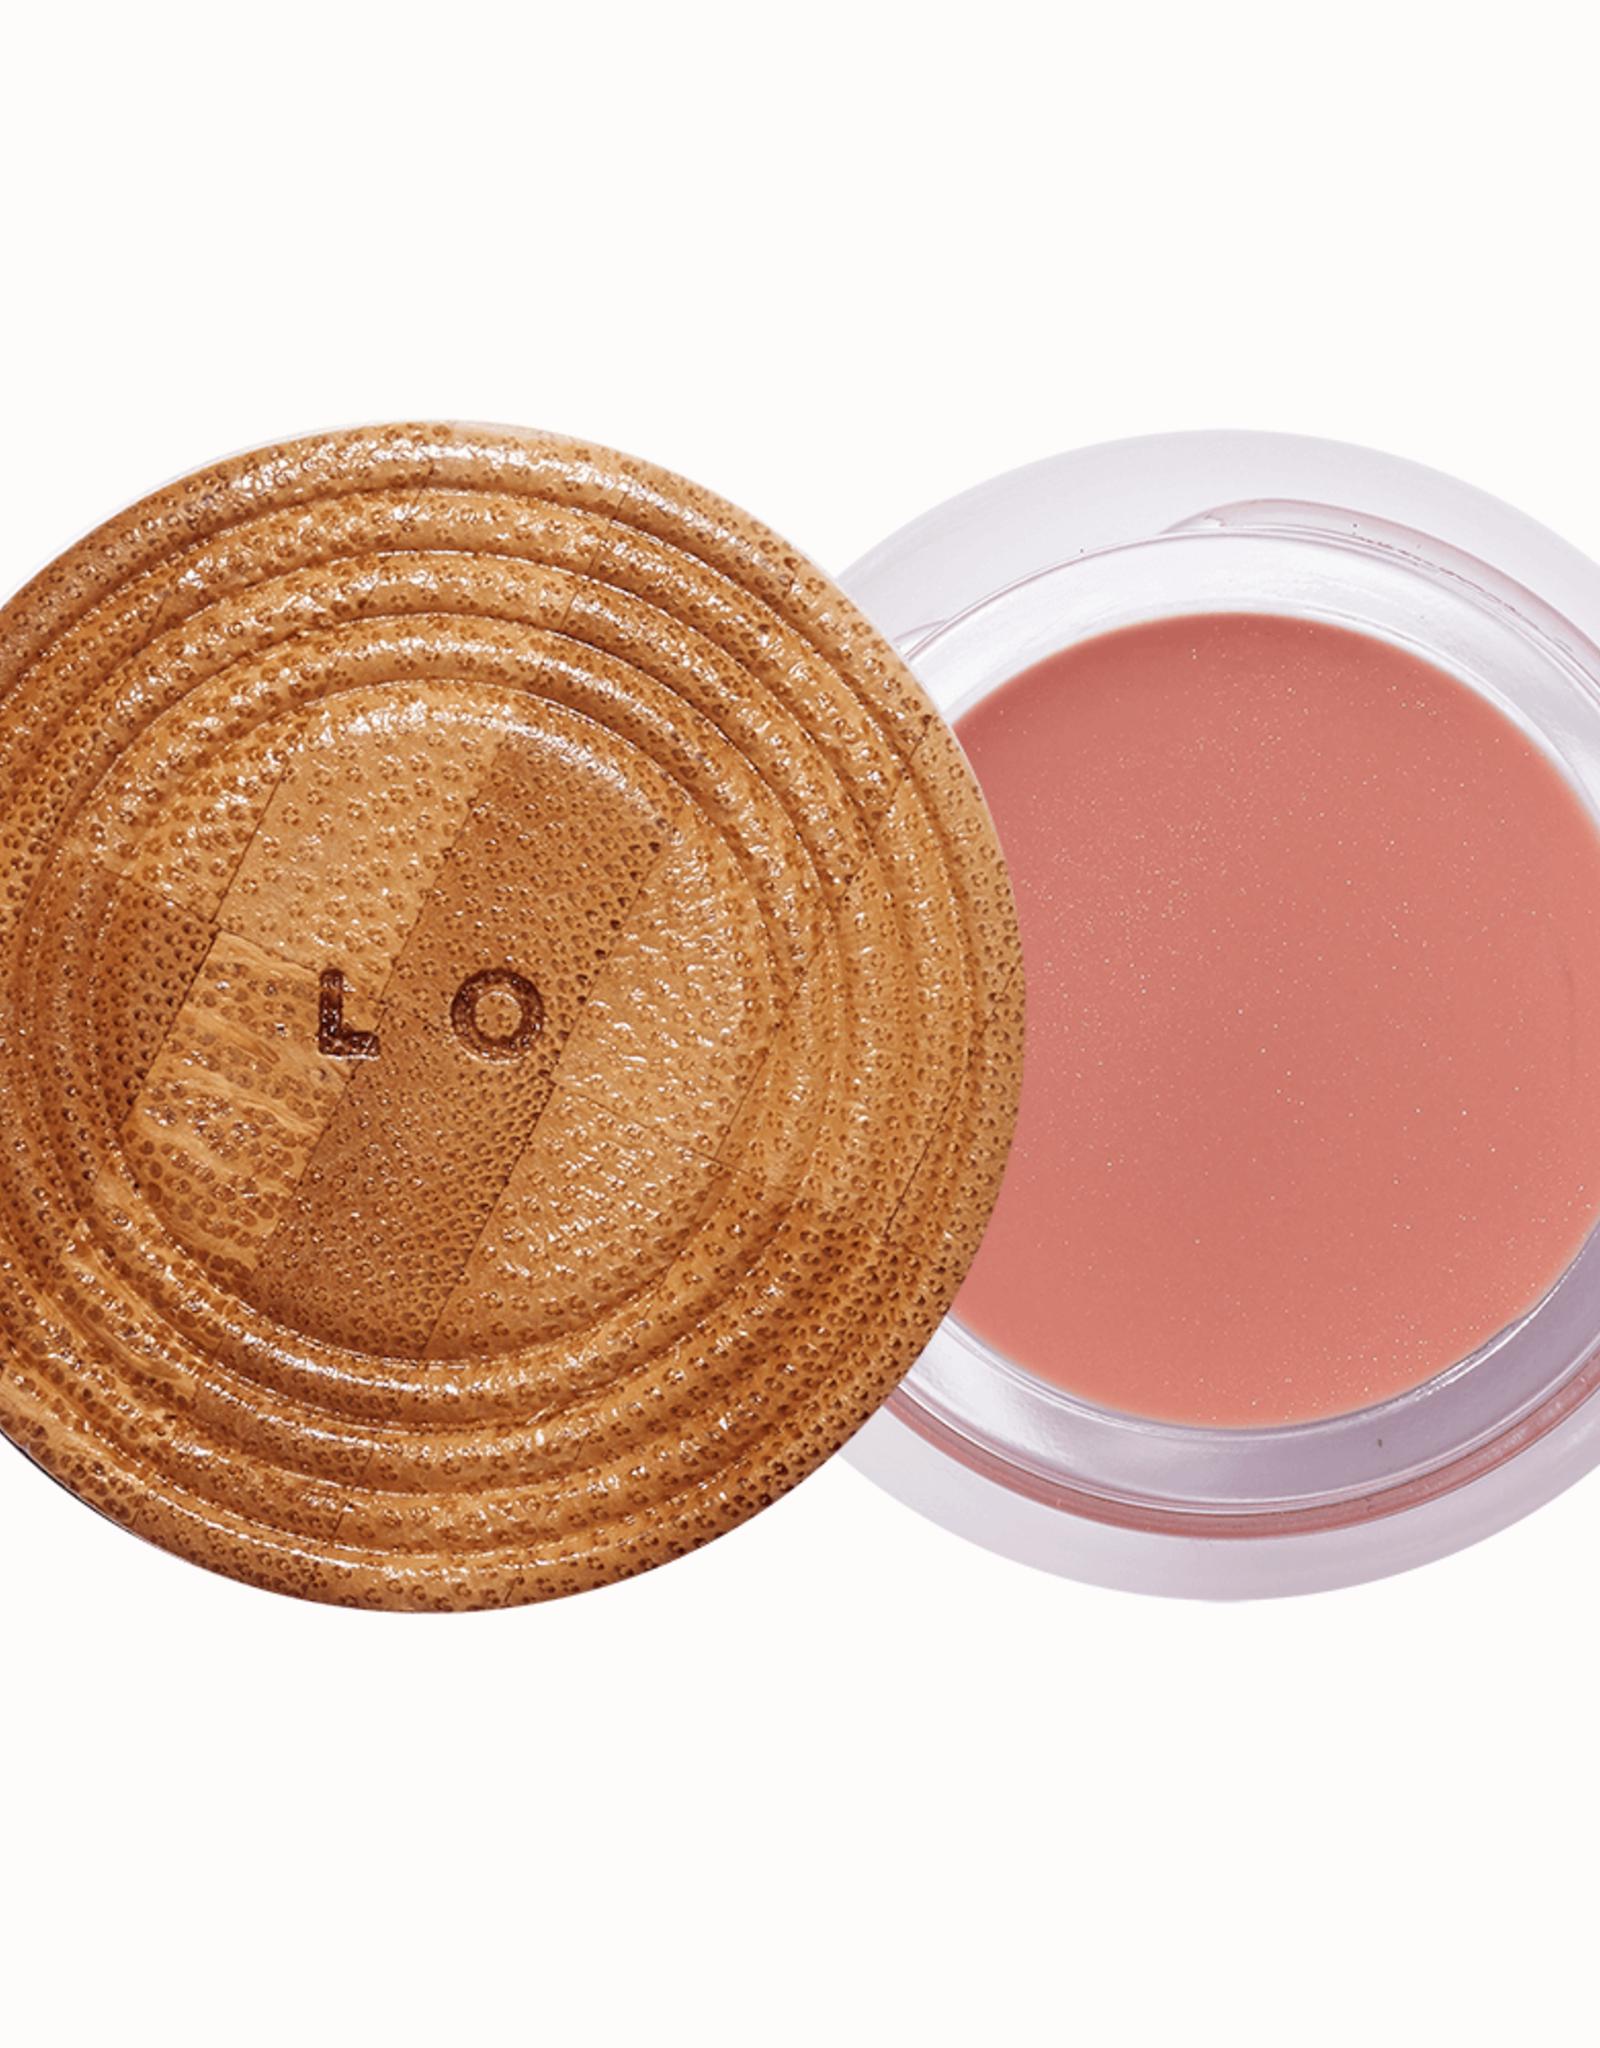 Lo Care Lip & Cheek Tint Bloom